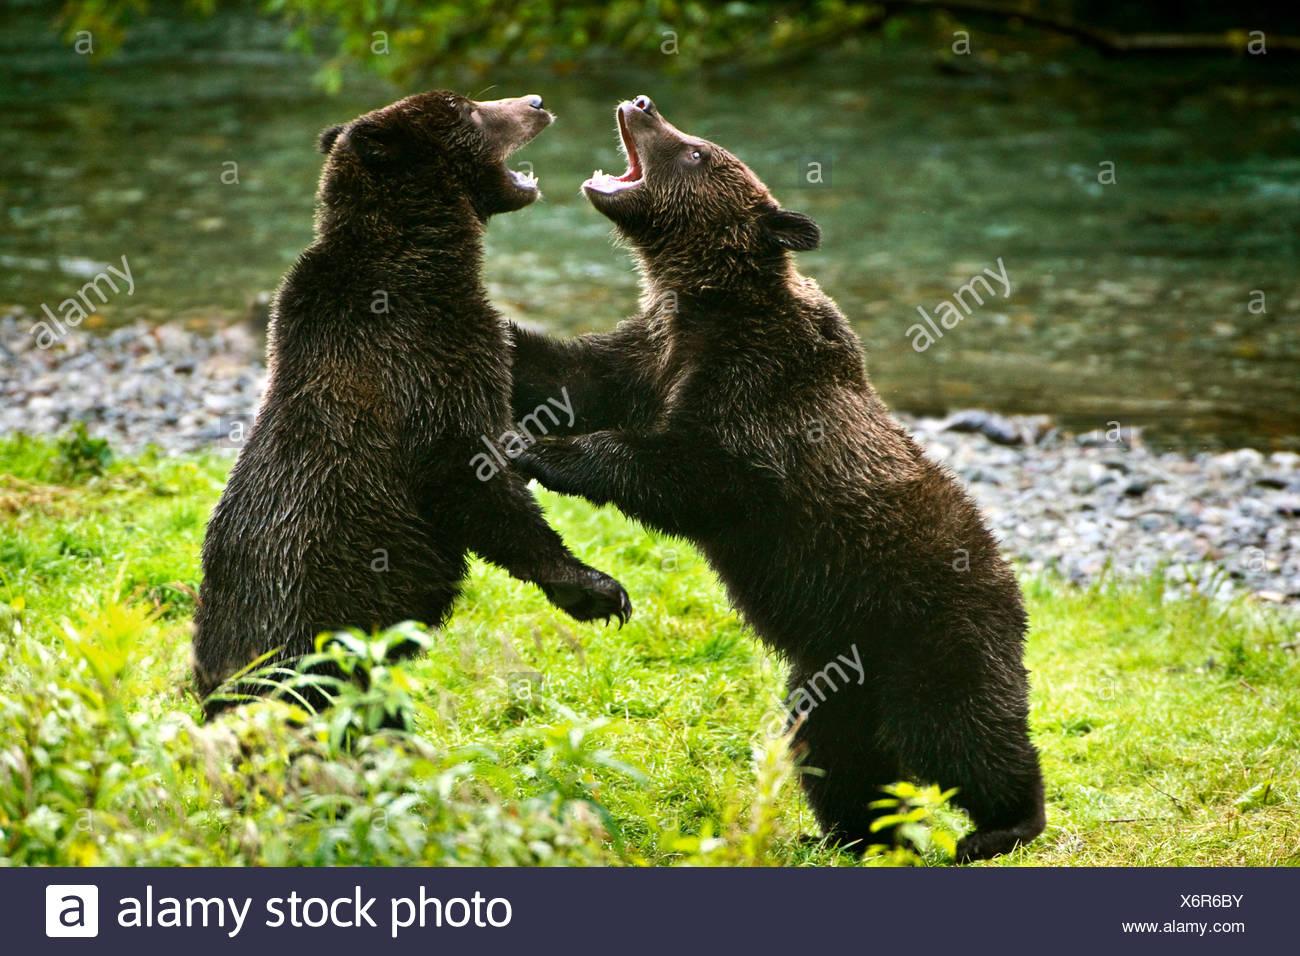 aggressive bear stock photos aggressive bear stock. Black Bedroom Furniture Sets. Home Design Ideas